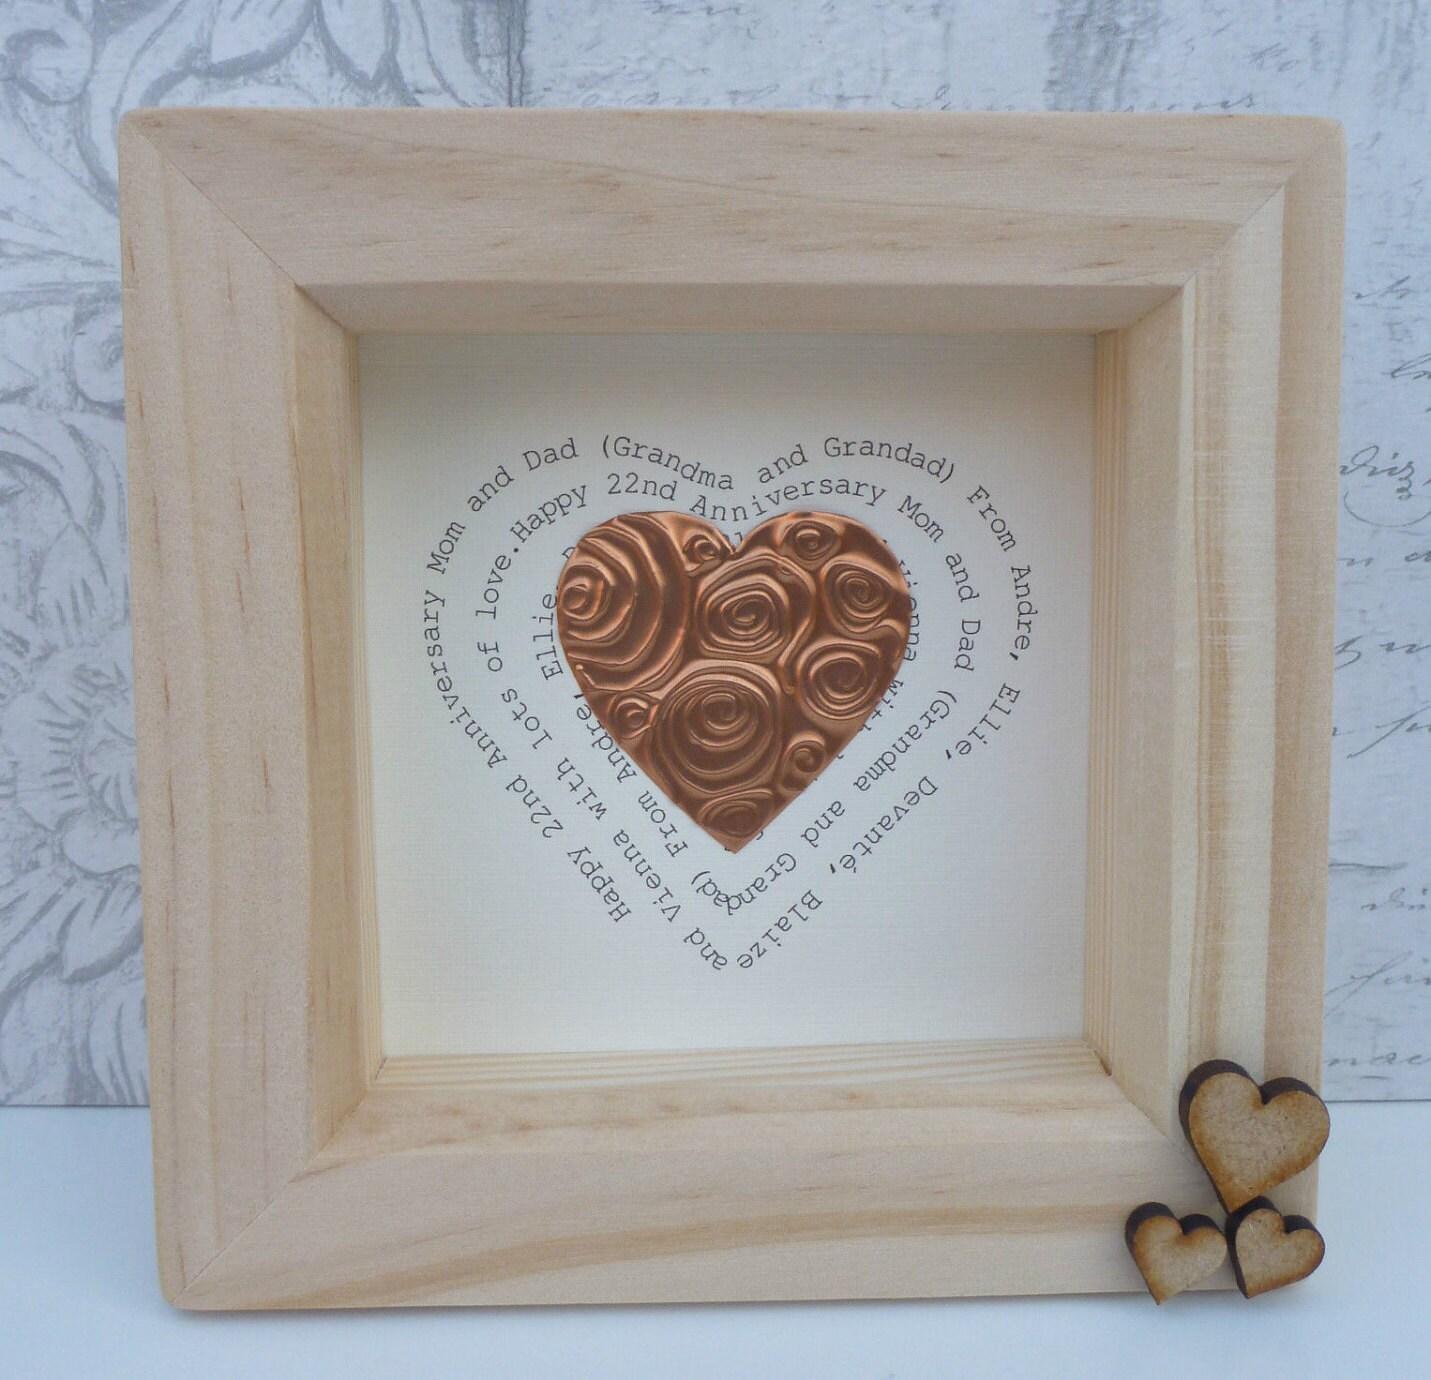 7th wedding anniversary gift copper anniversary gift 7th copper anniversary 22nd wedding gift 7th anniversary 22nd anniversary framed